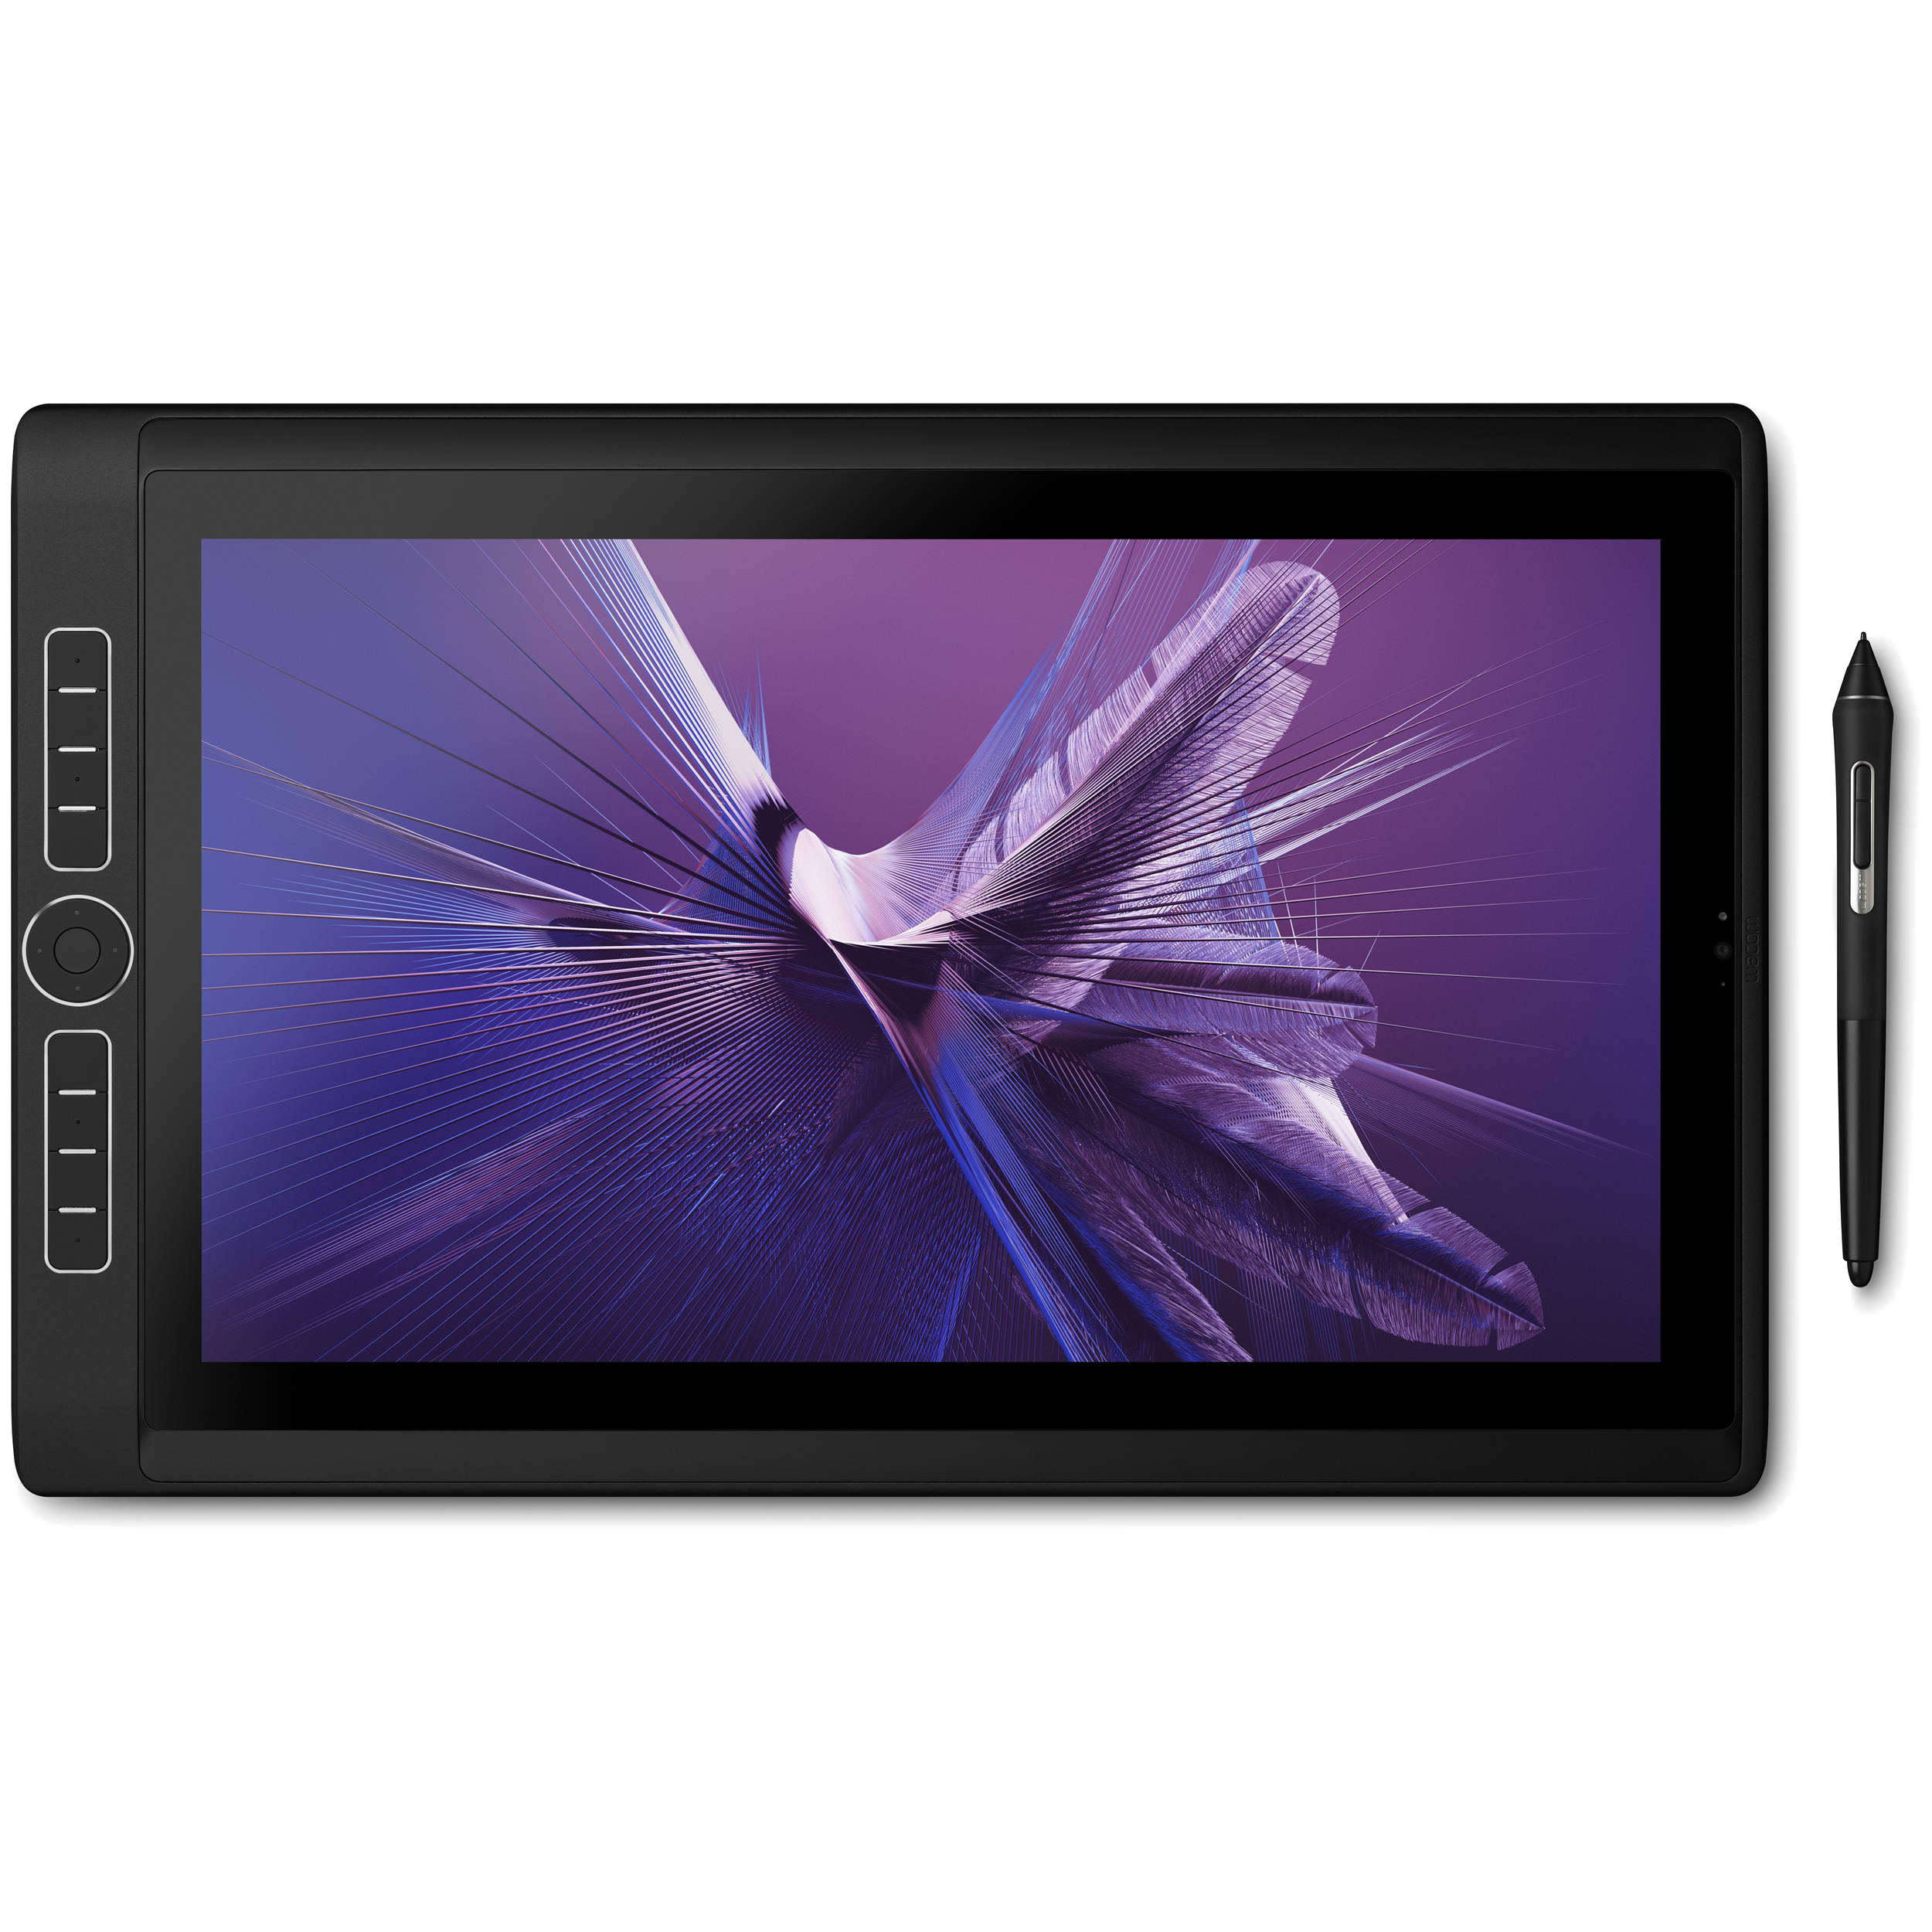 MobileStudio Pro image